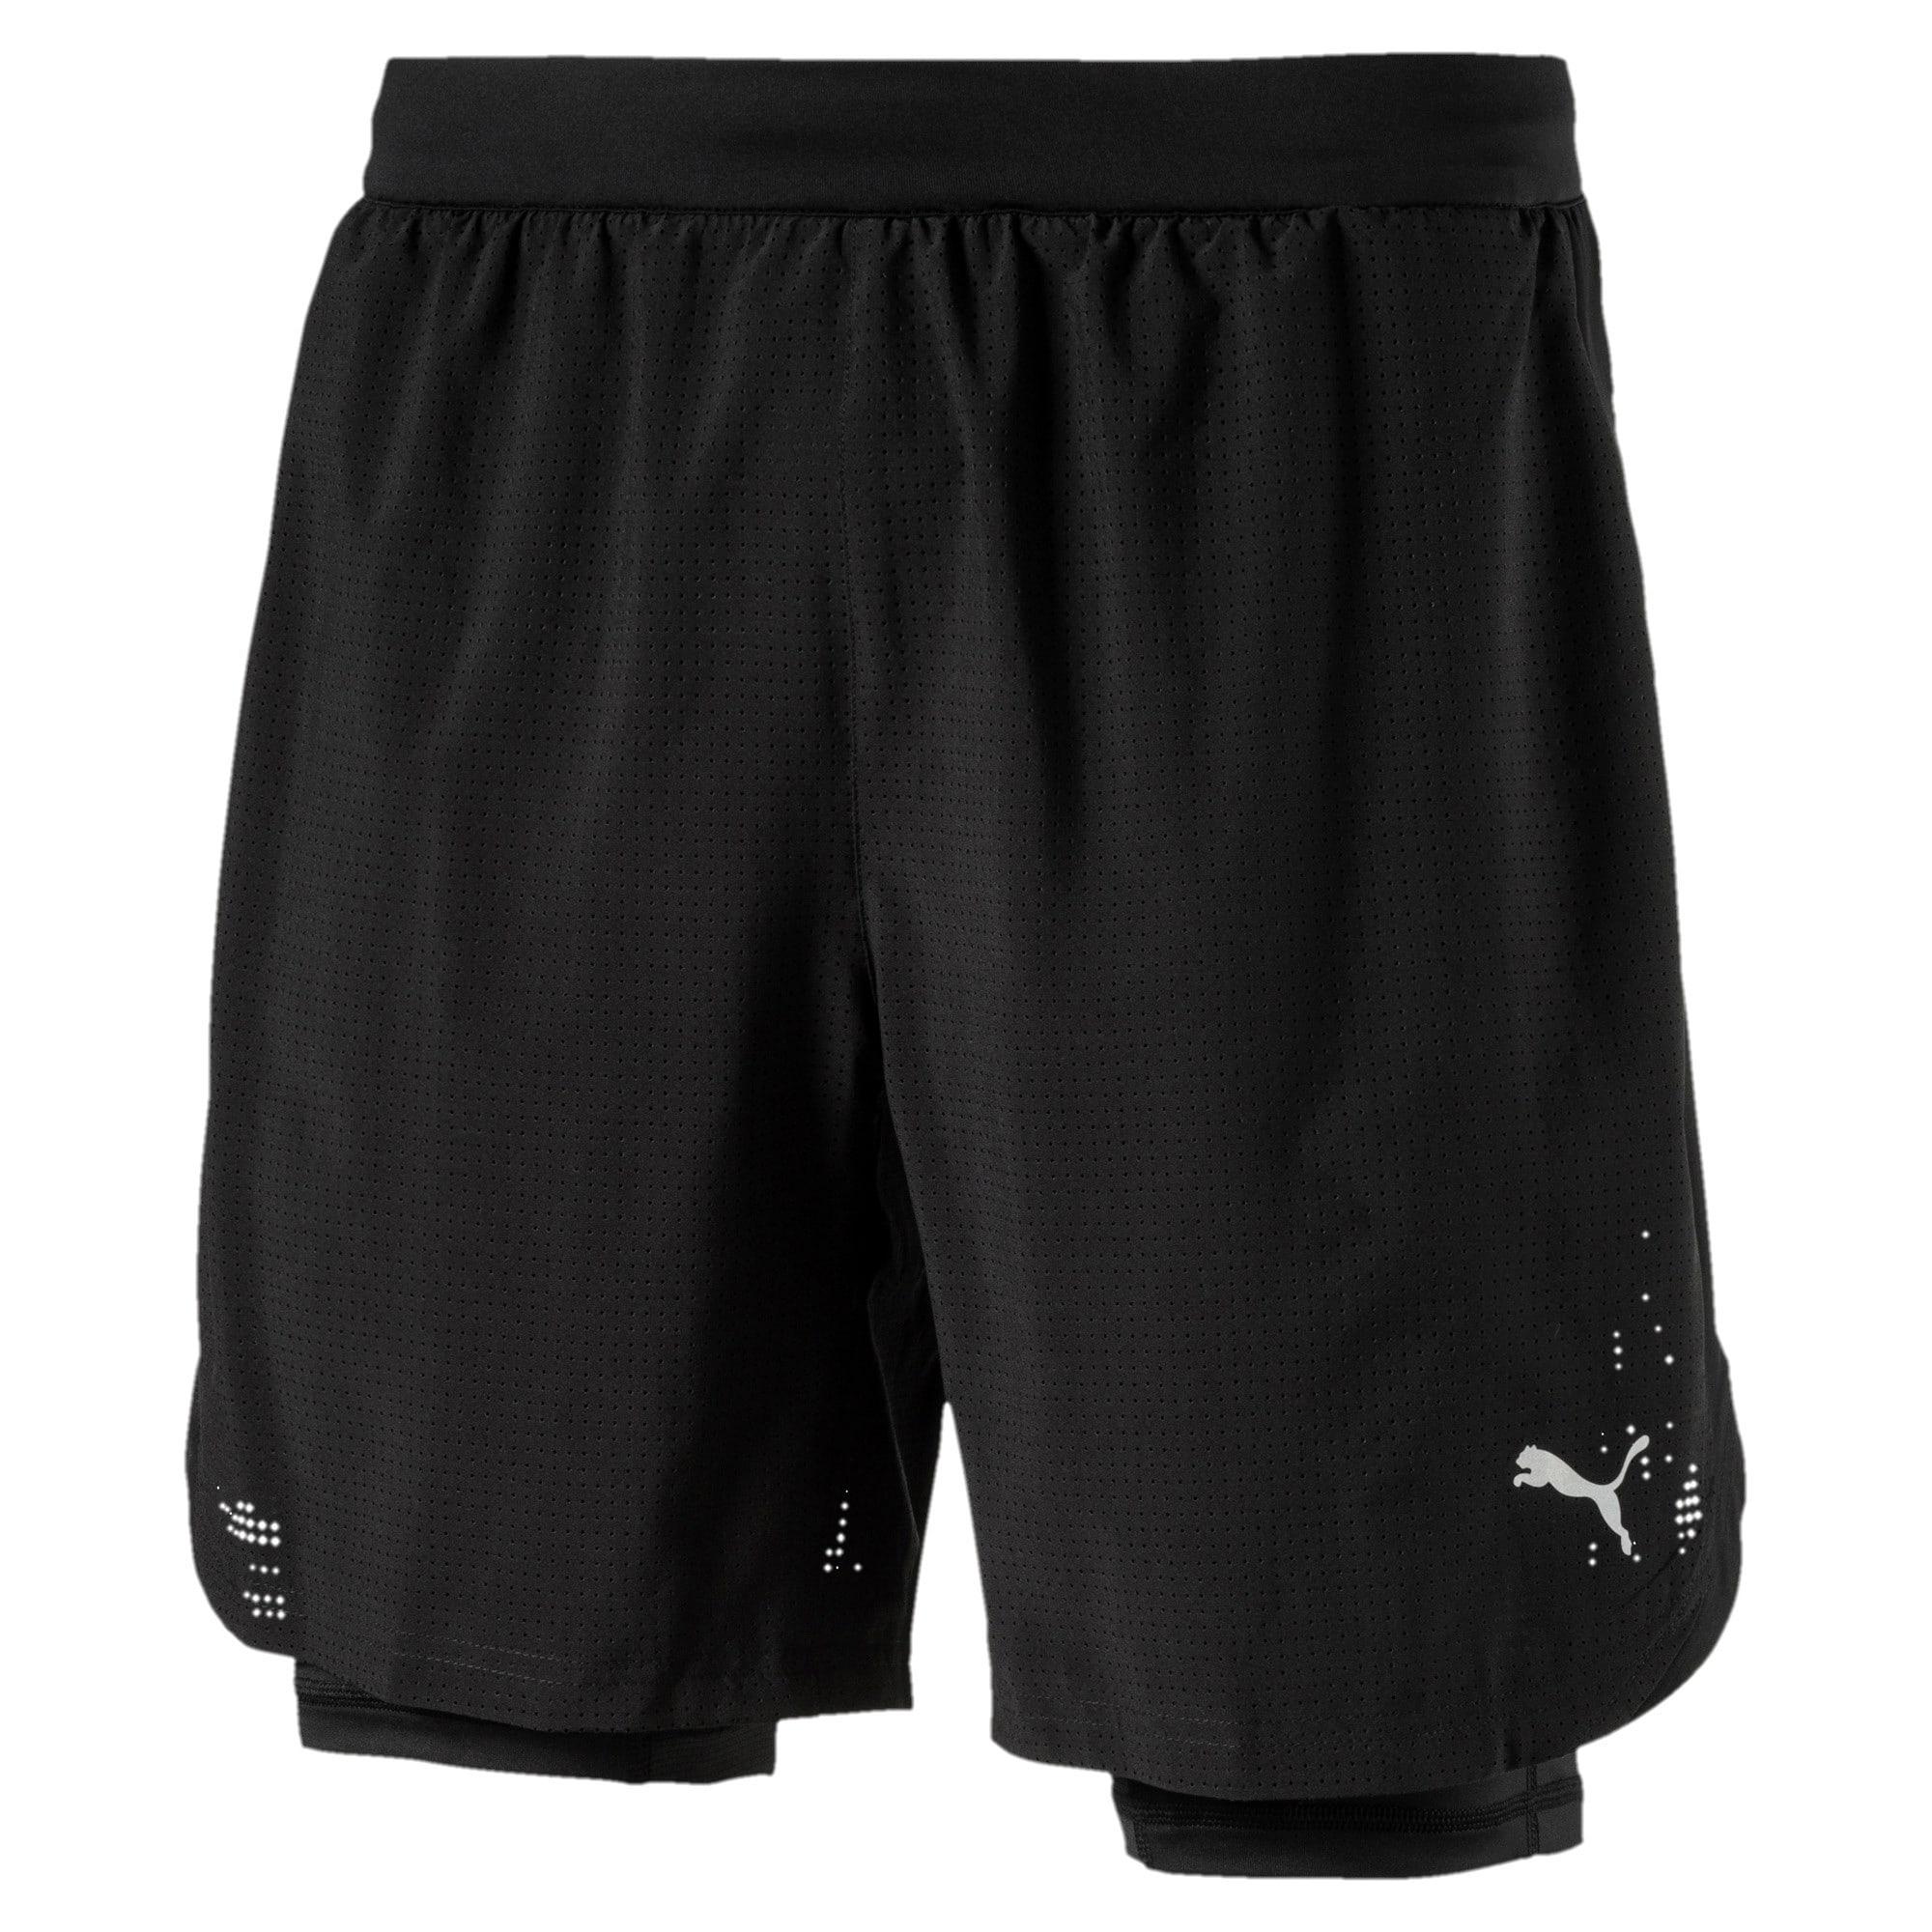 Thumbnail 1 of Running Men's Pace 2 in 1 Shorts, Puma Black, medium-IND